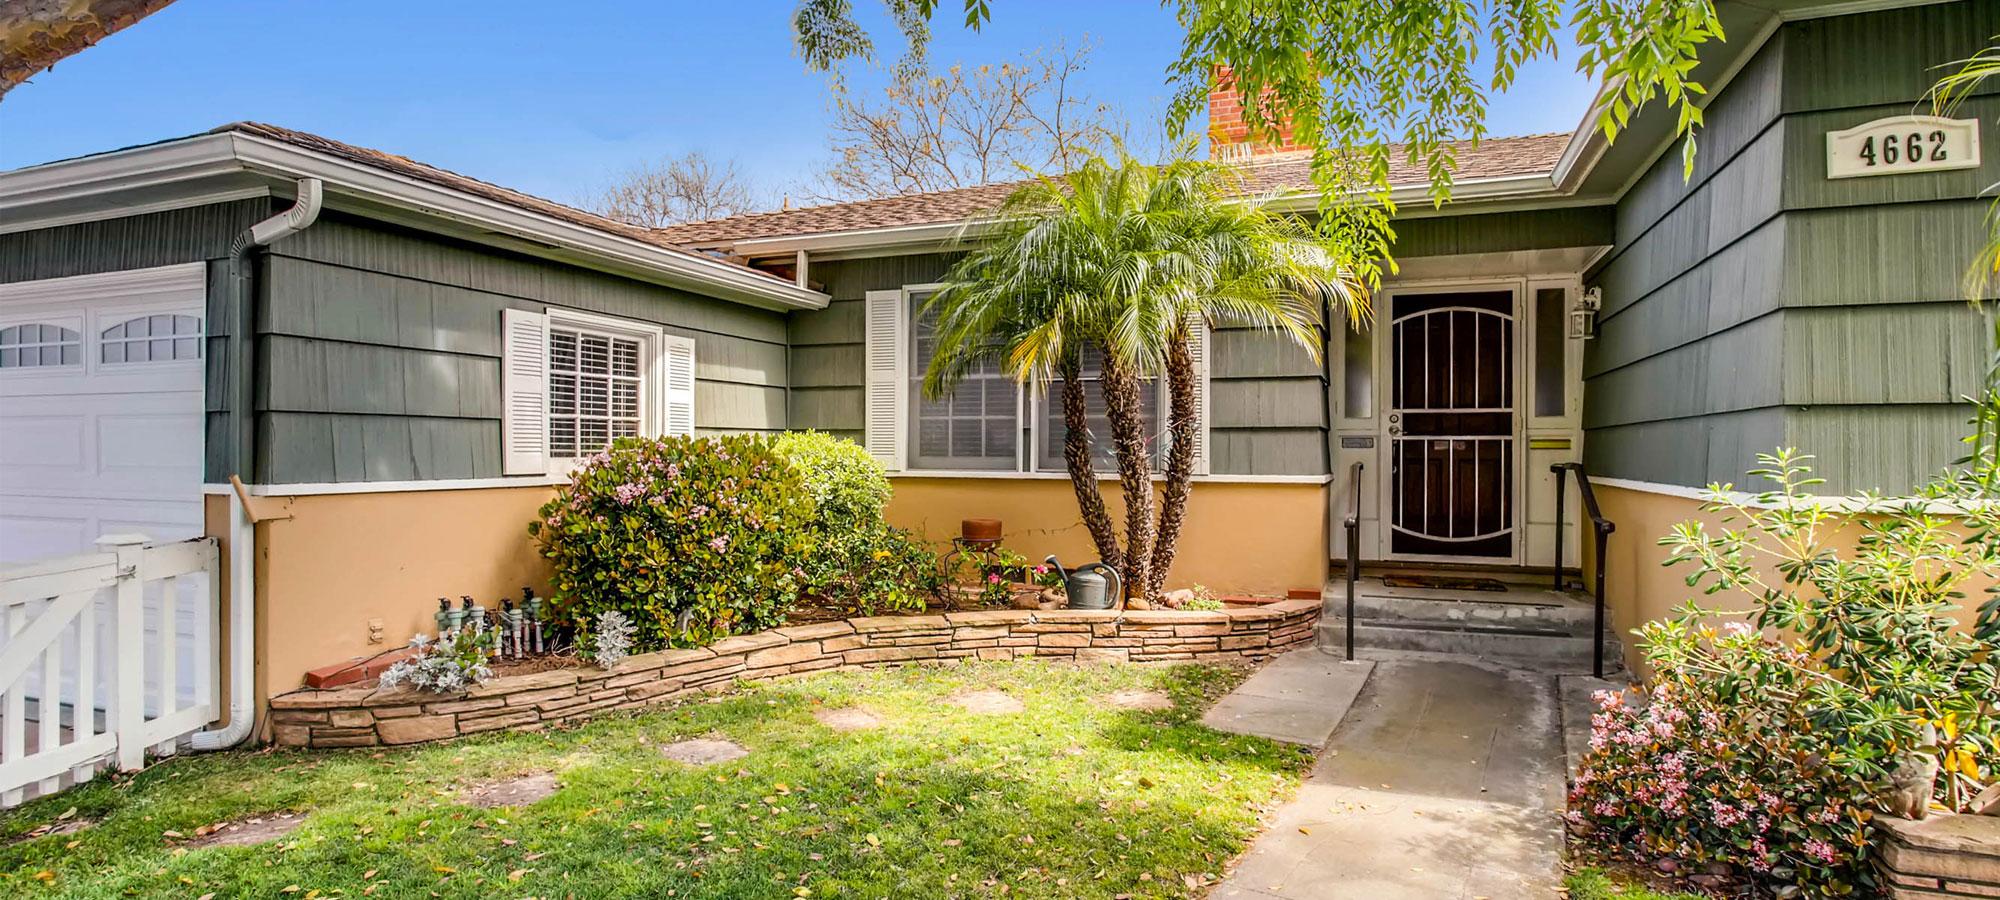 4662 Lucille Dr. San Diego, CA 92115